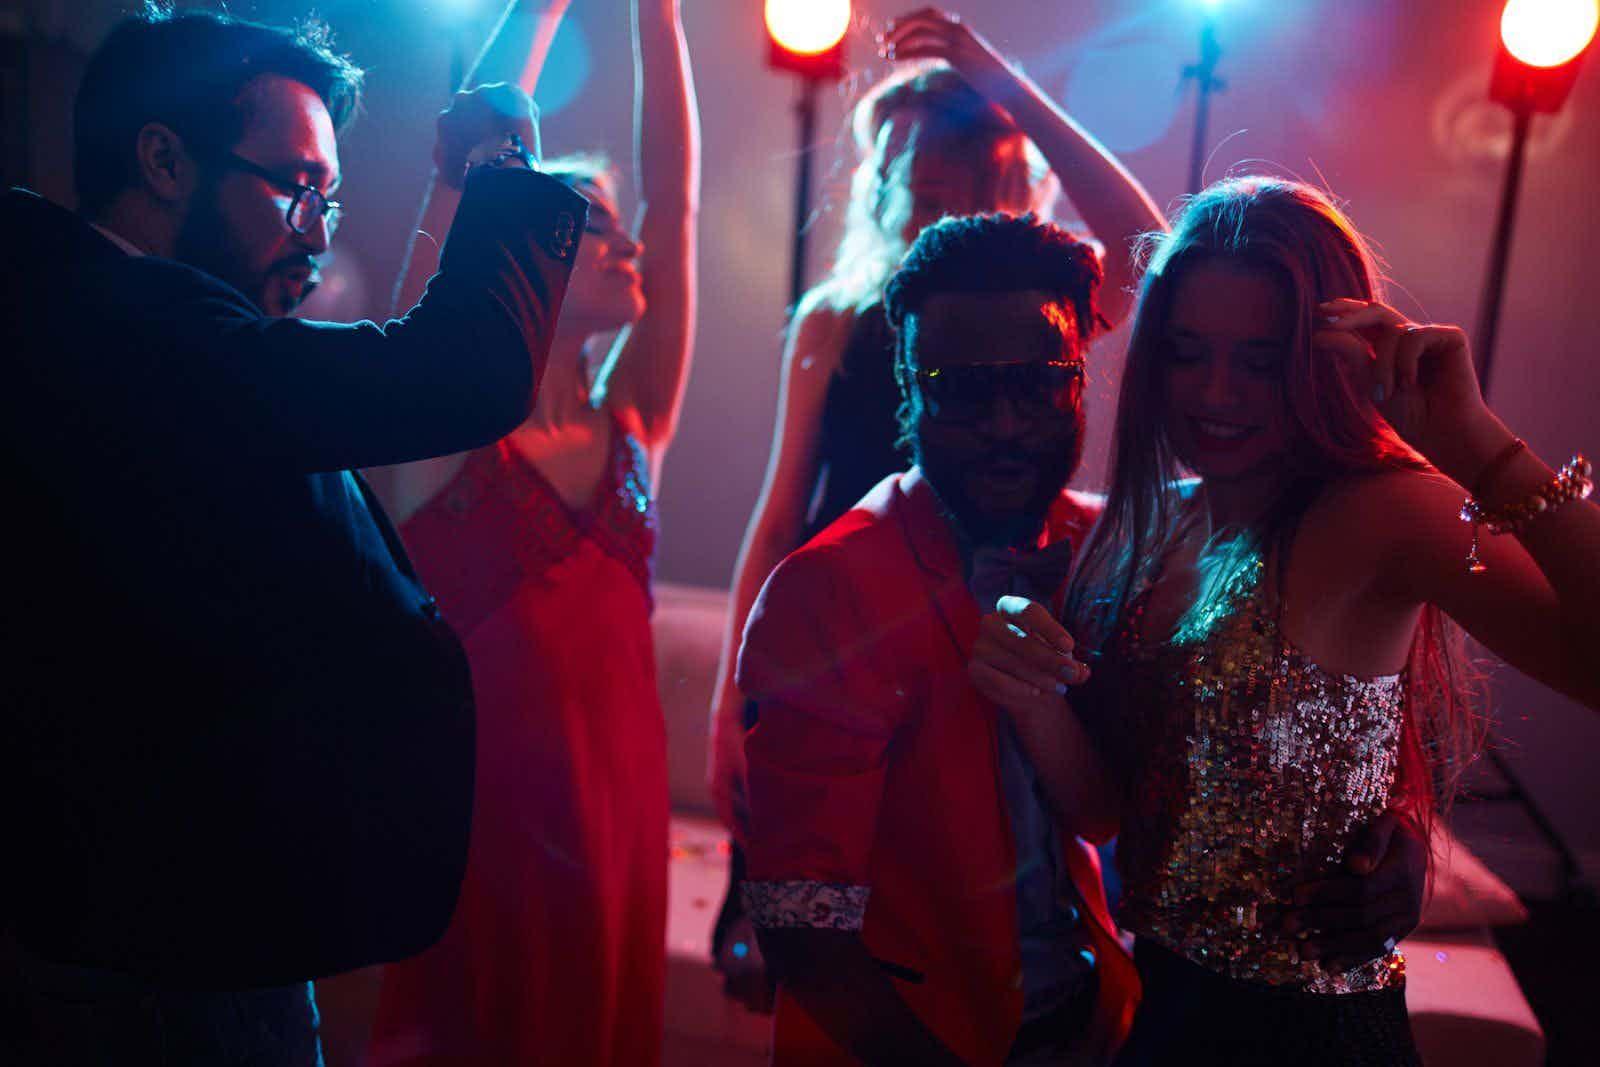 dance-party-4